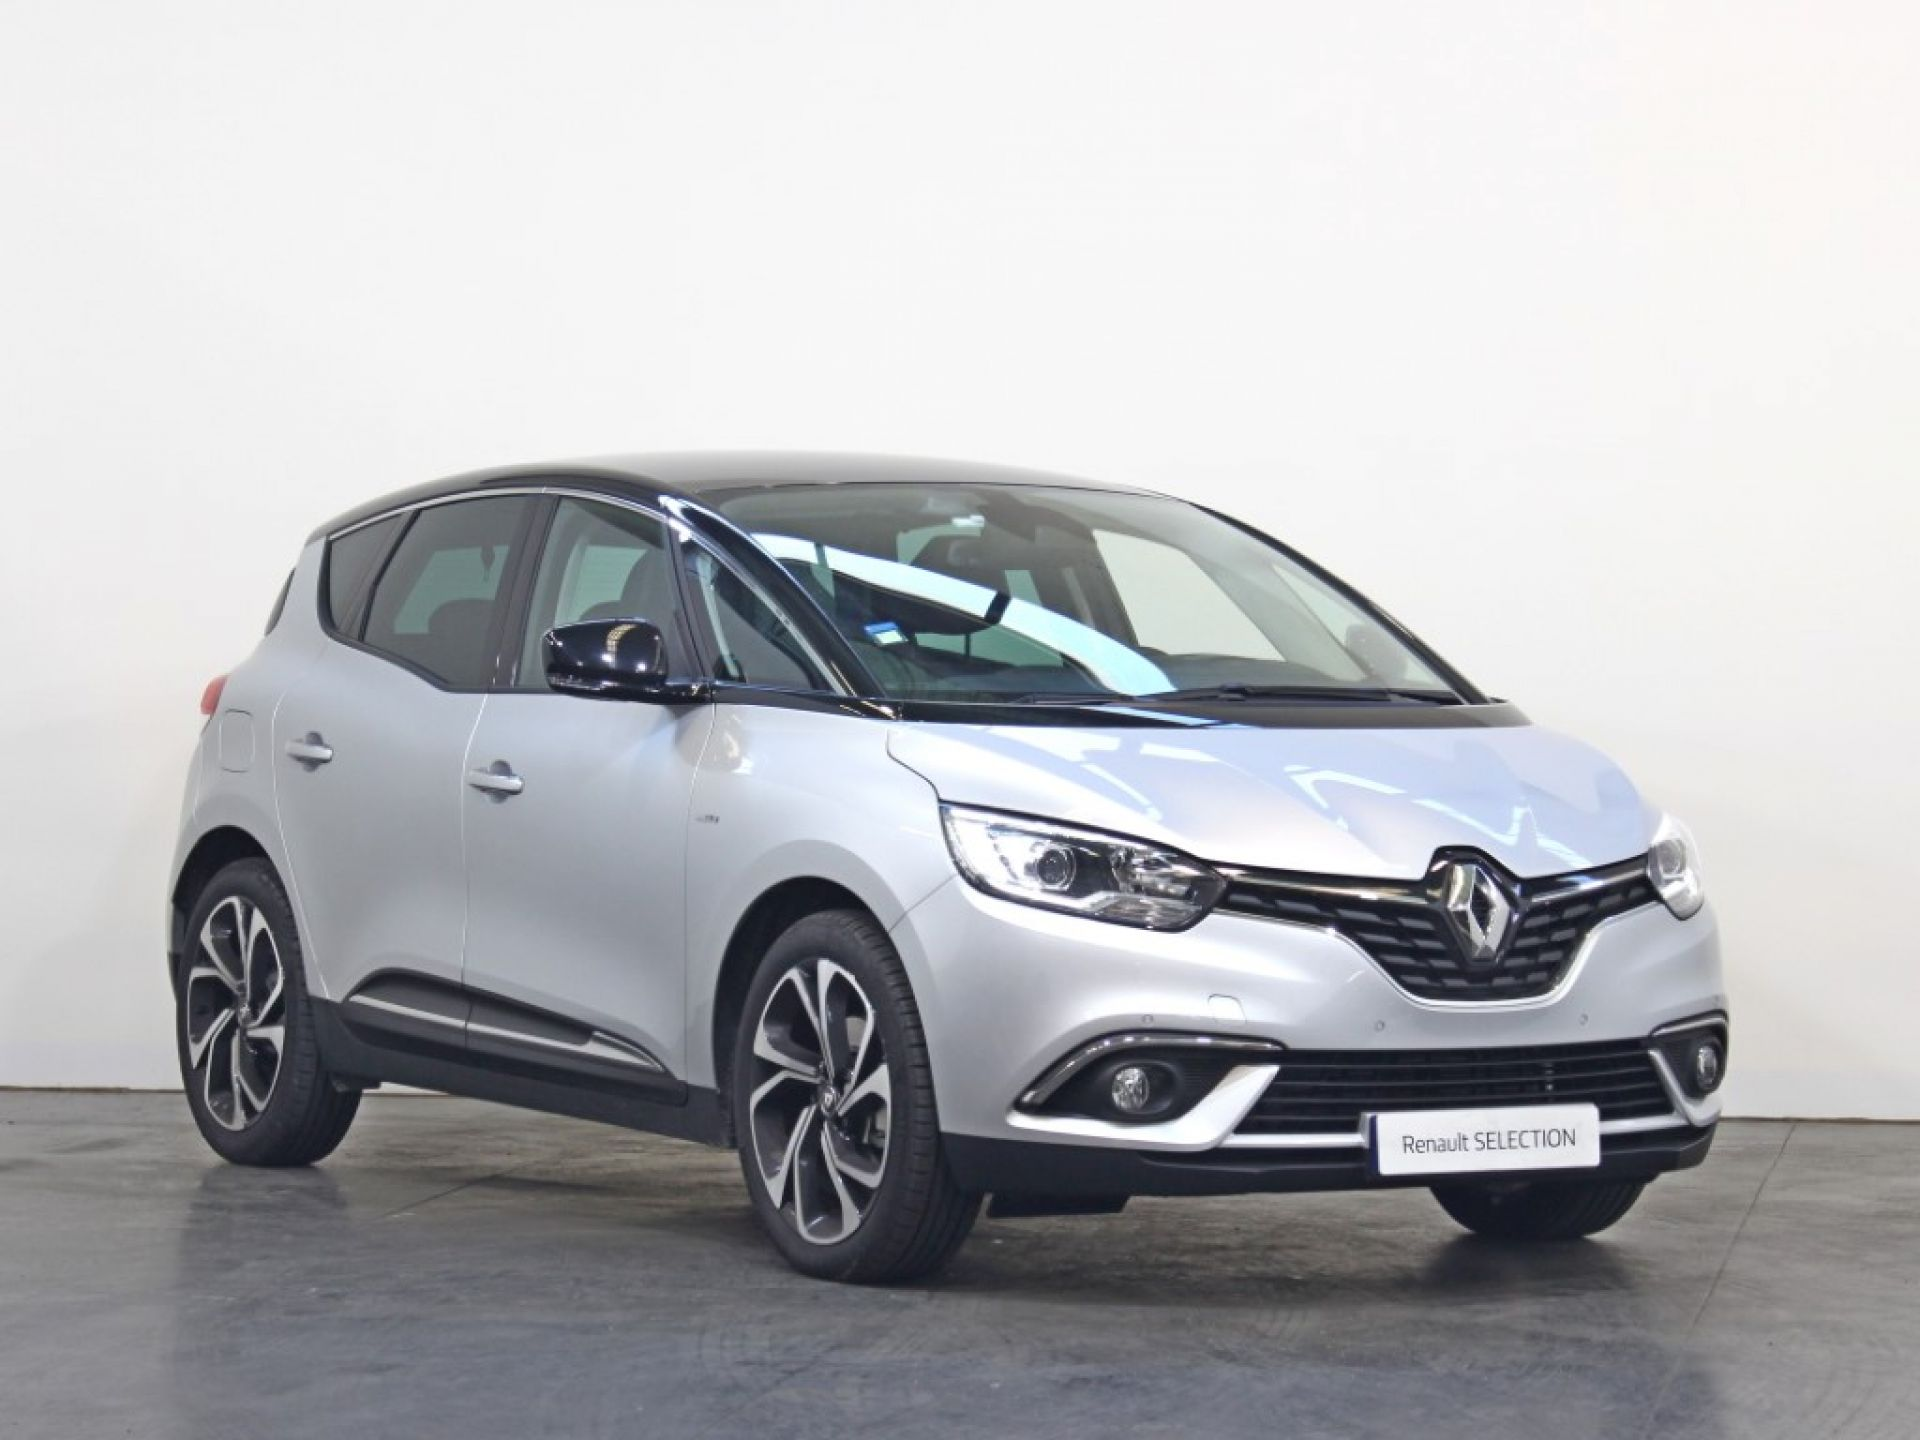 Renault Scenic 1.7 Blue dCi 150 Bose Edition EDC segunda mão Porto